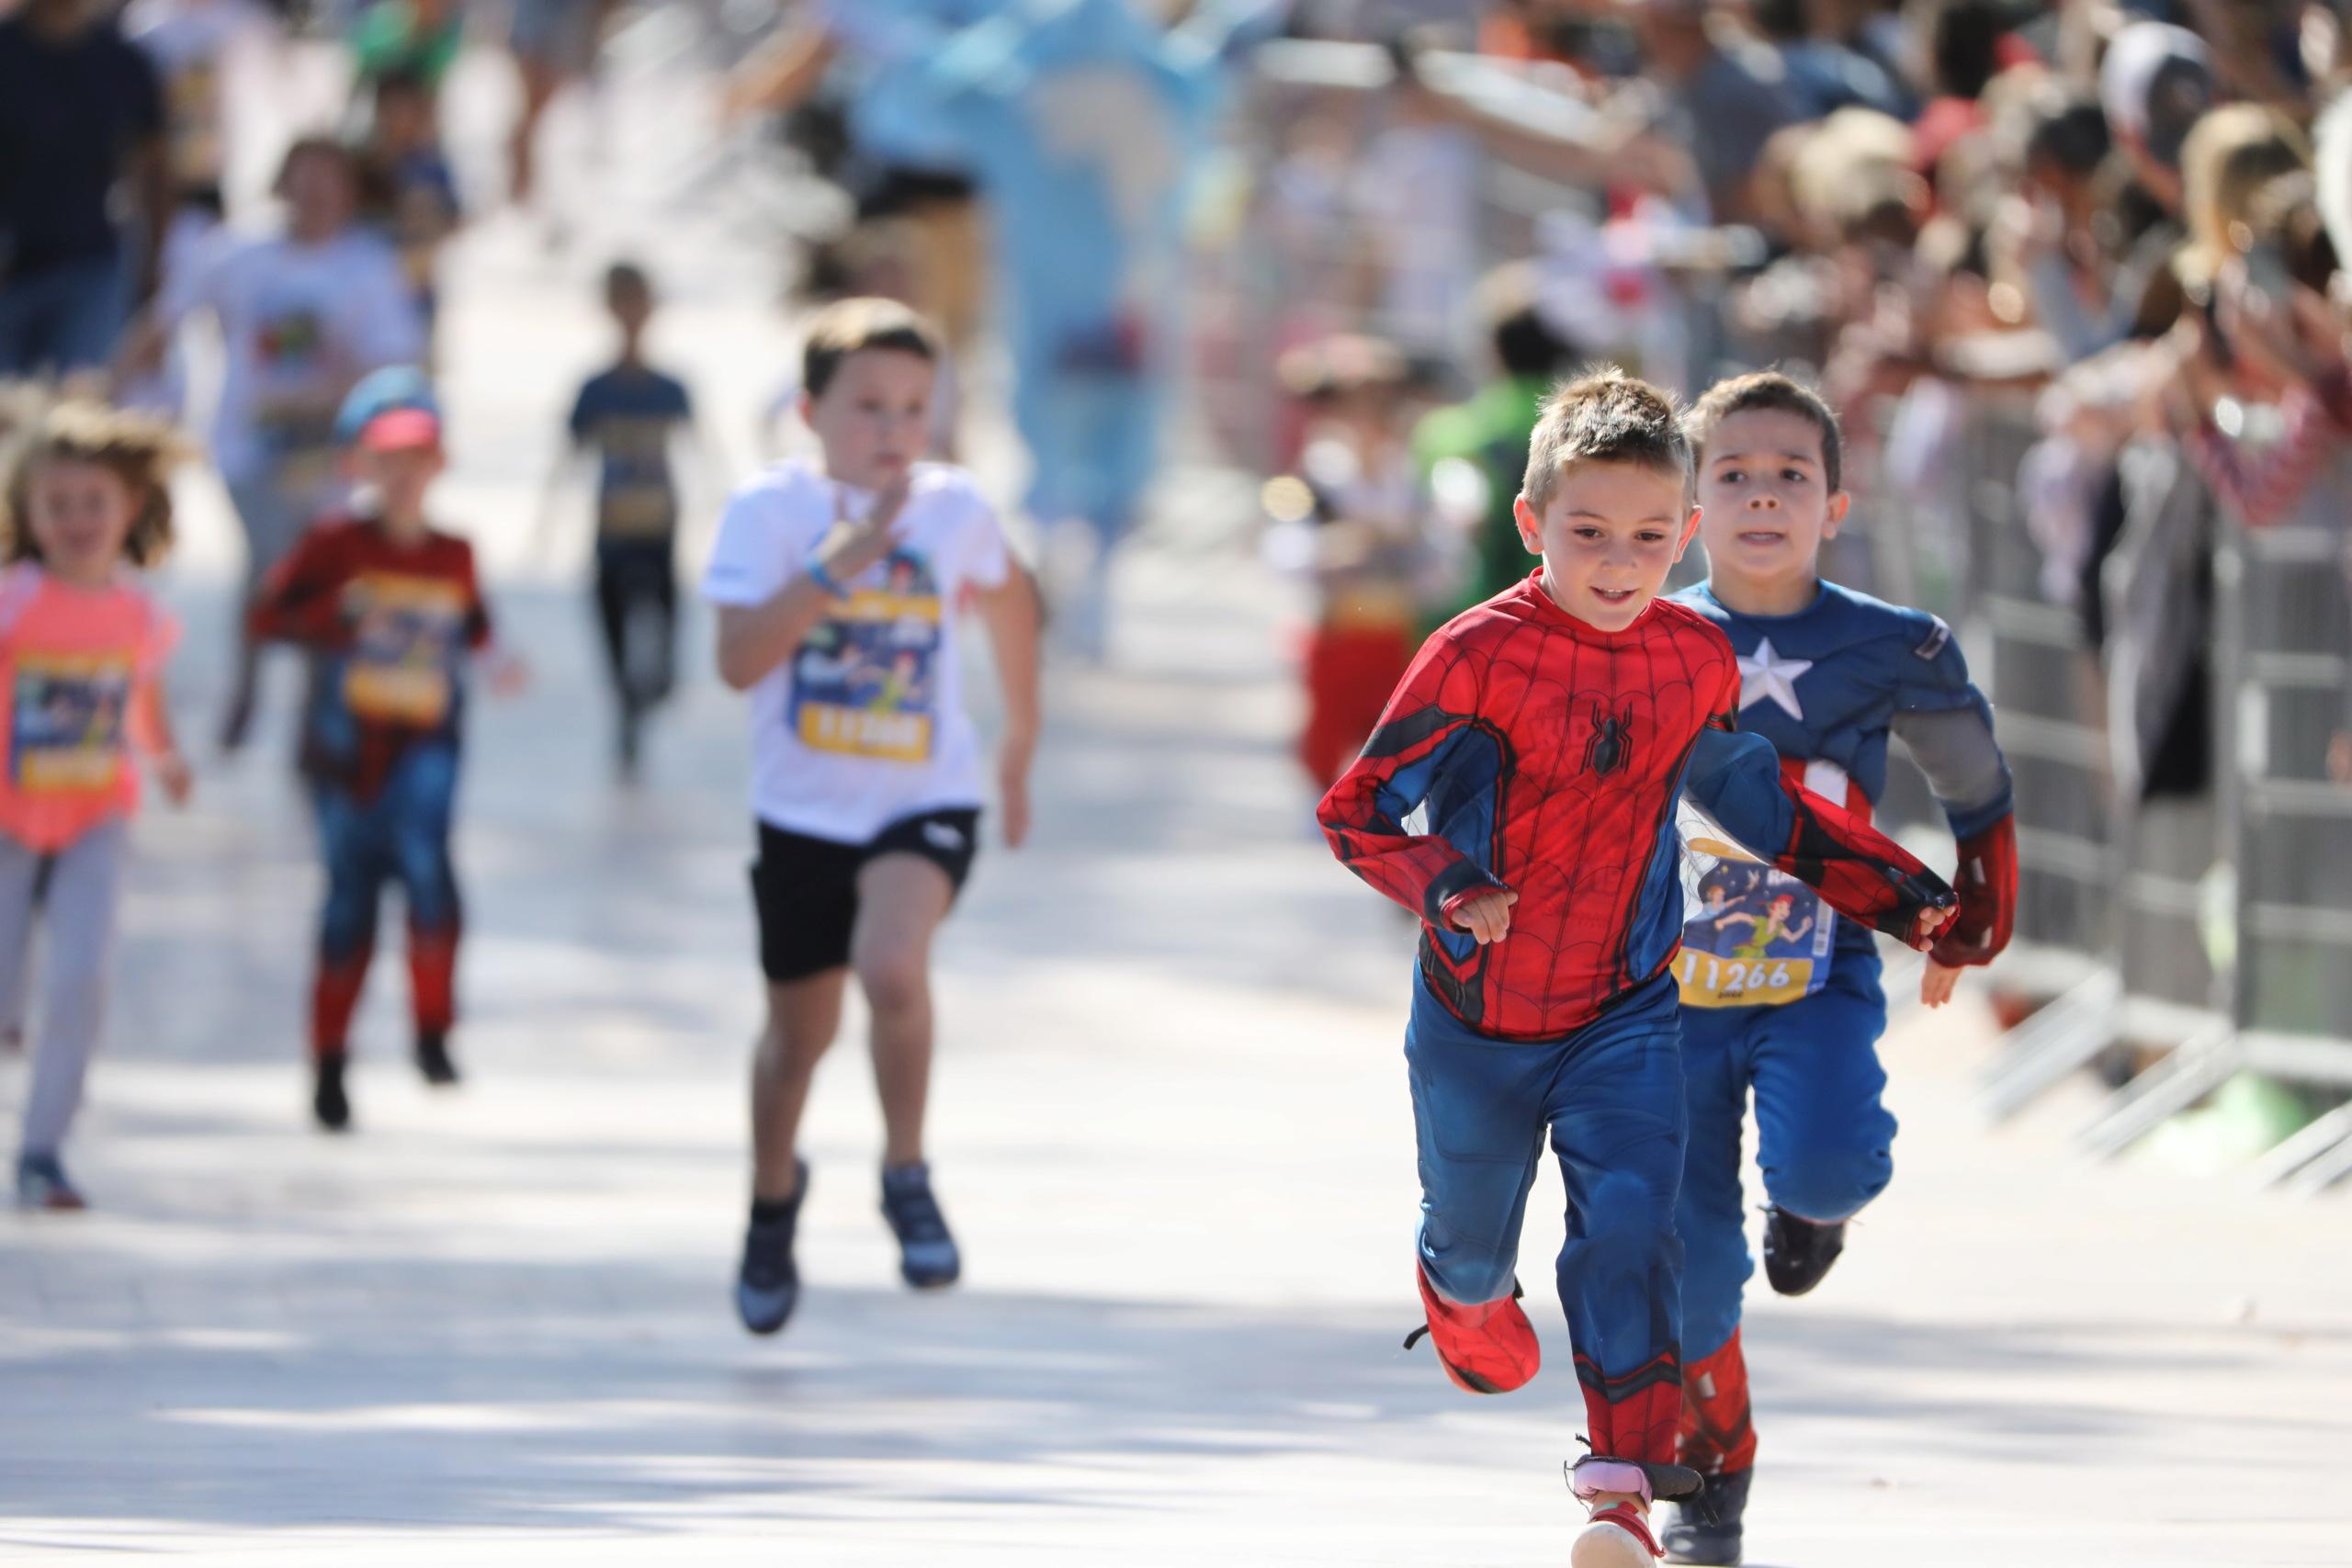 2019 - Disneyland Paris Run Weekend - Pagina 3 Kidrac17